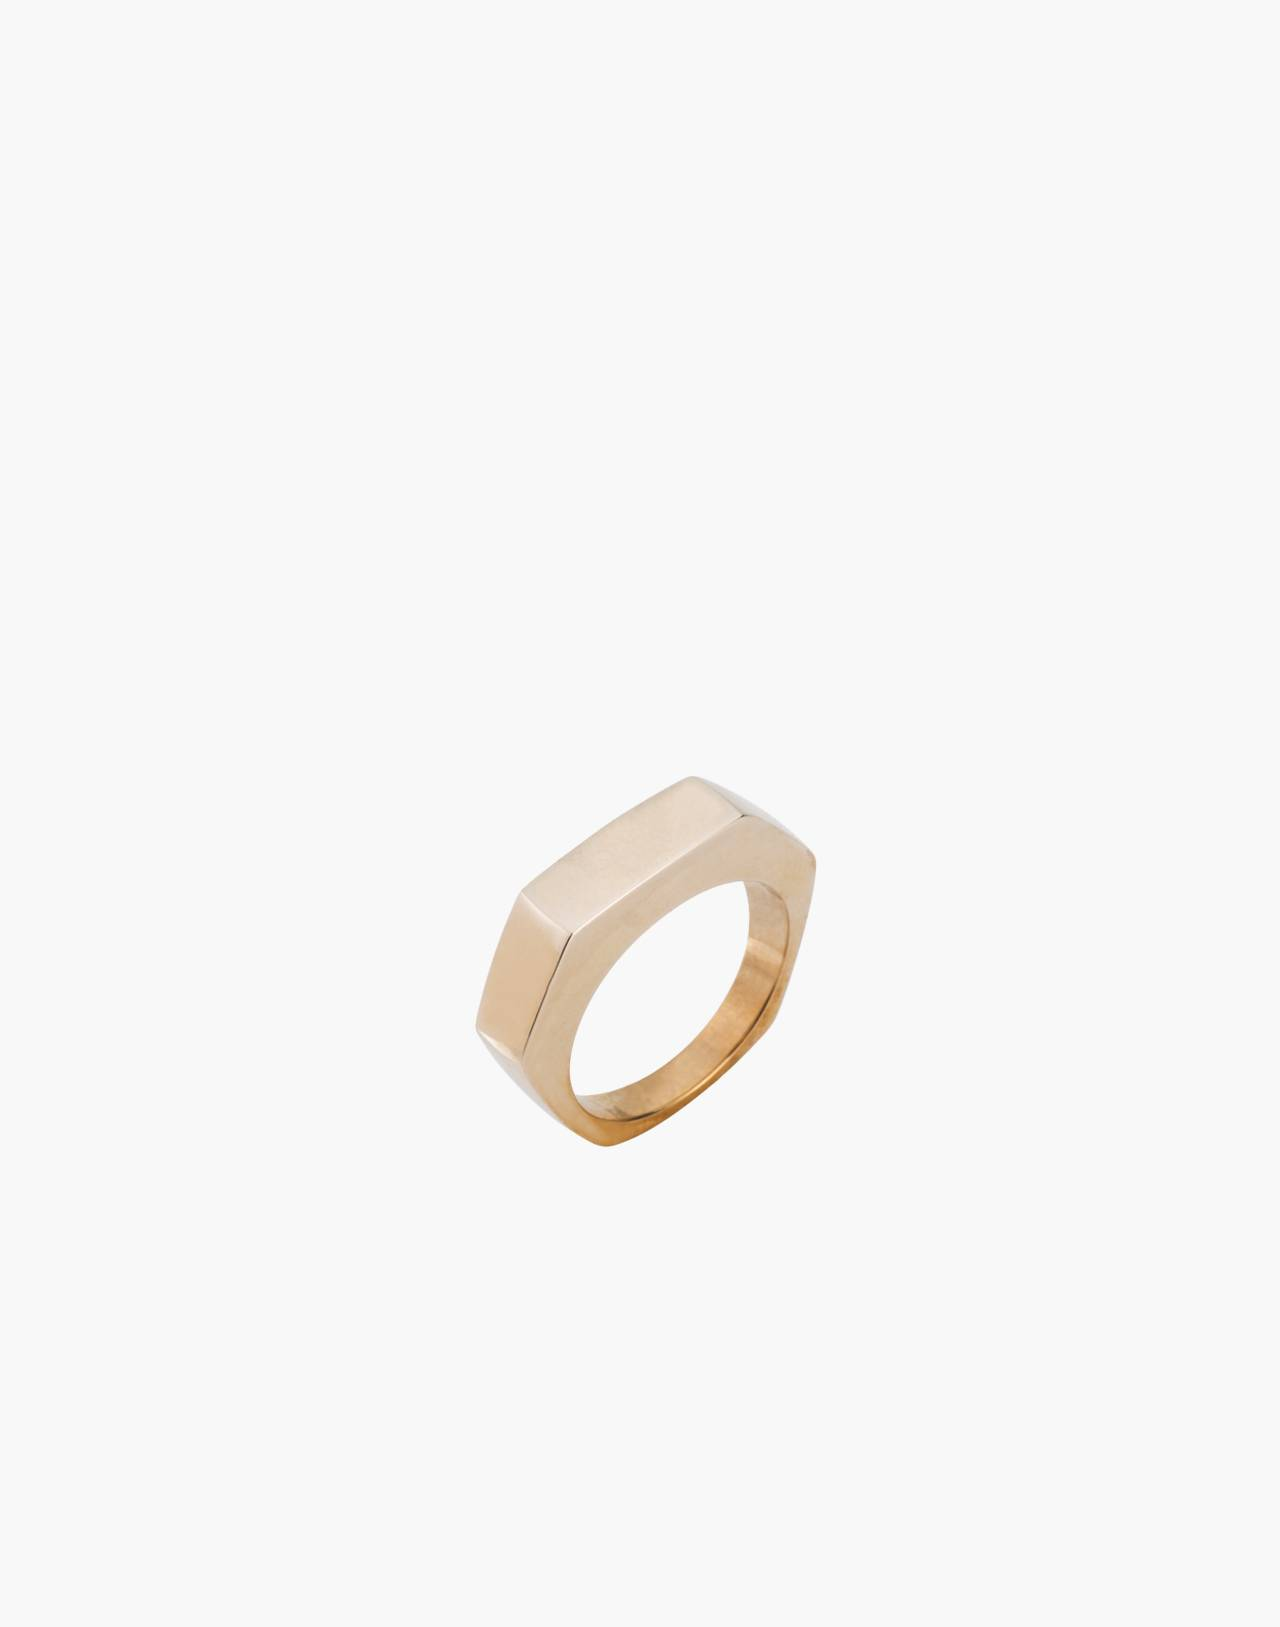 Charlotte Cauwe Studio Brass Slim Hex Ring in gold image 1